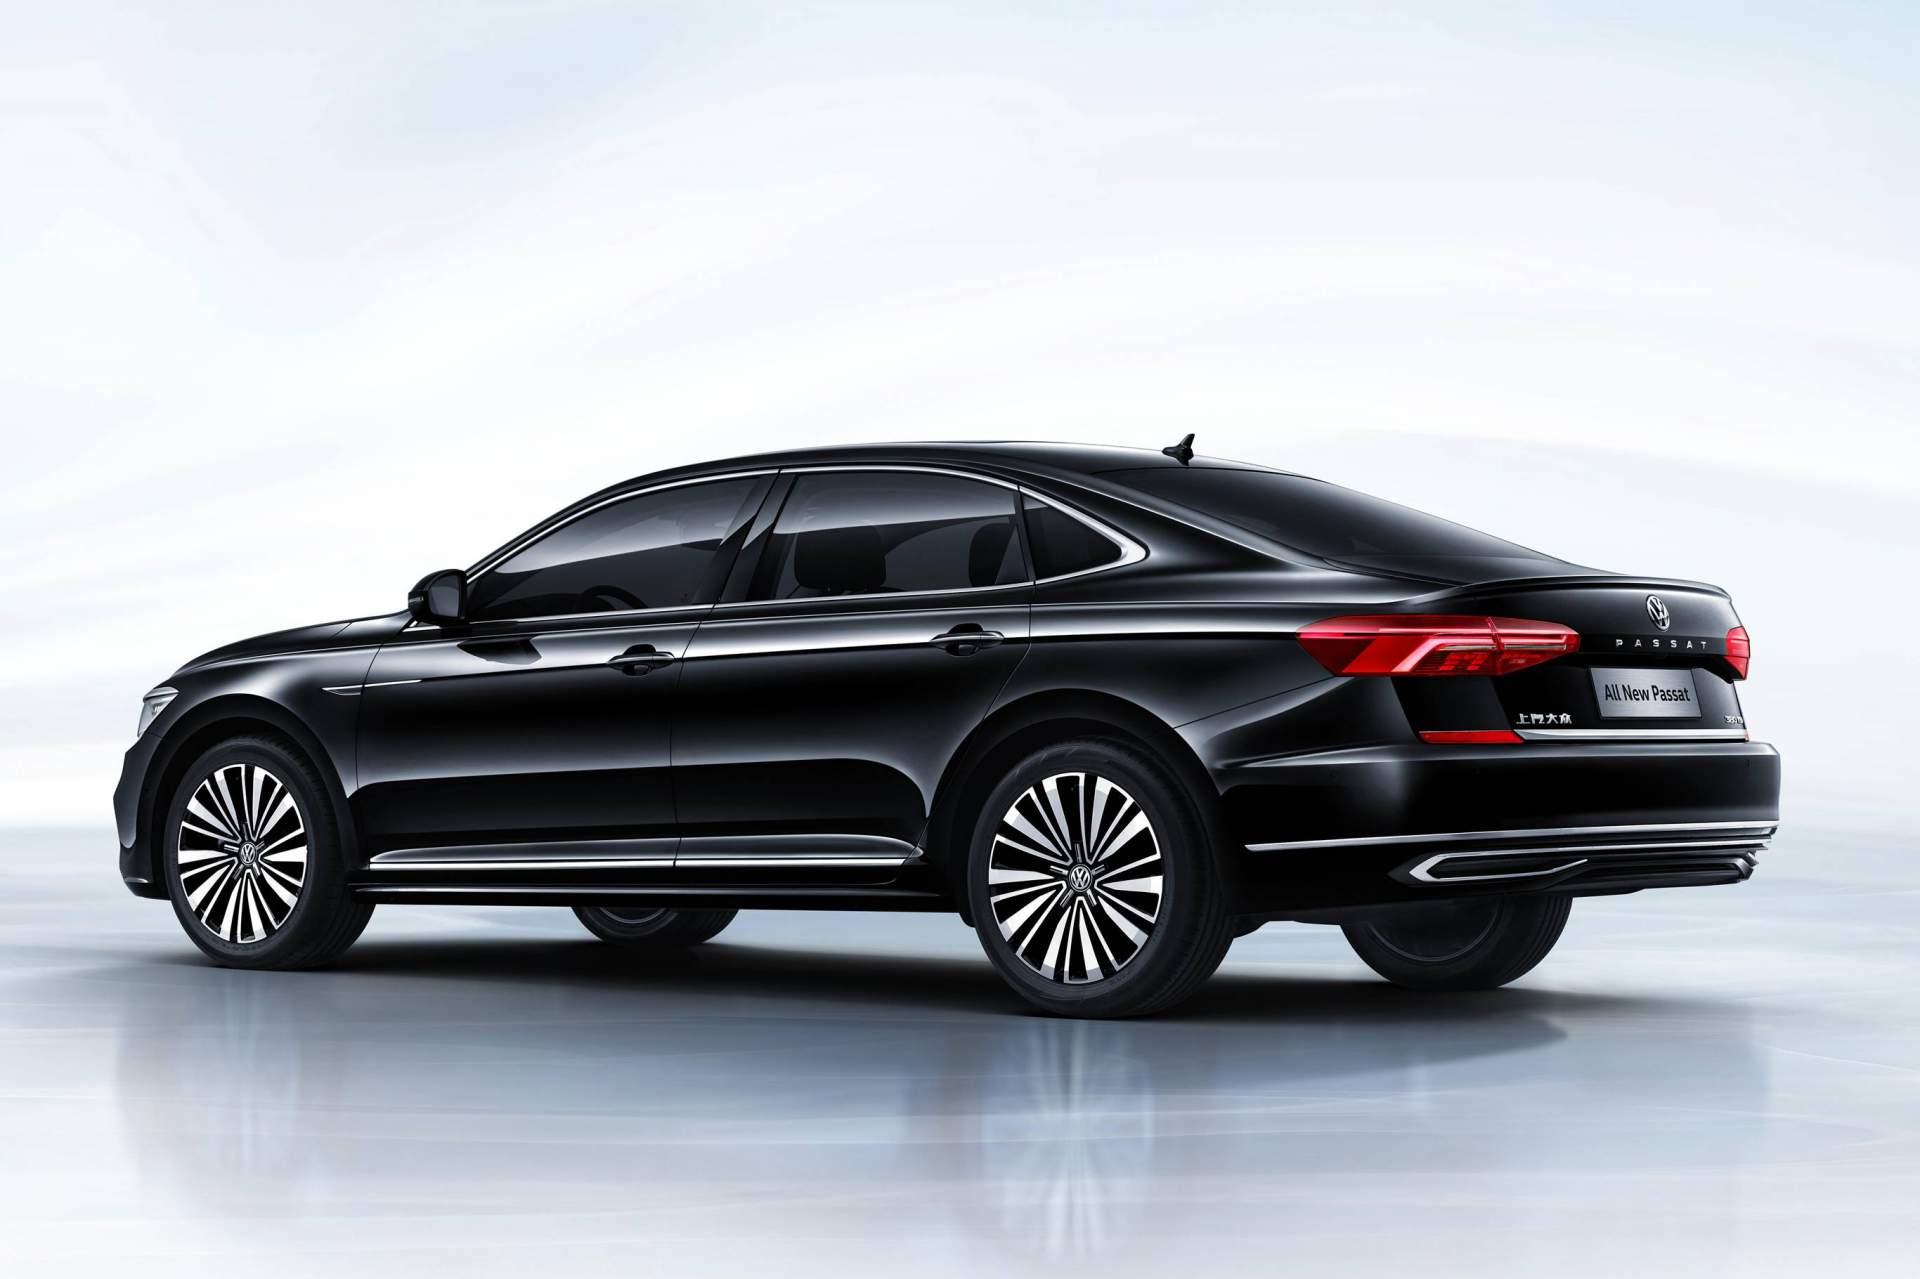 2019 volkswagen passat revealed in china, previews u.s. model